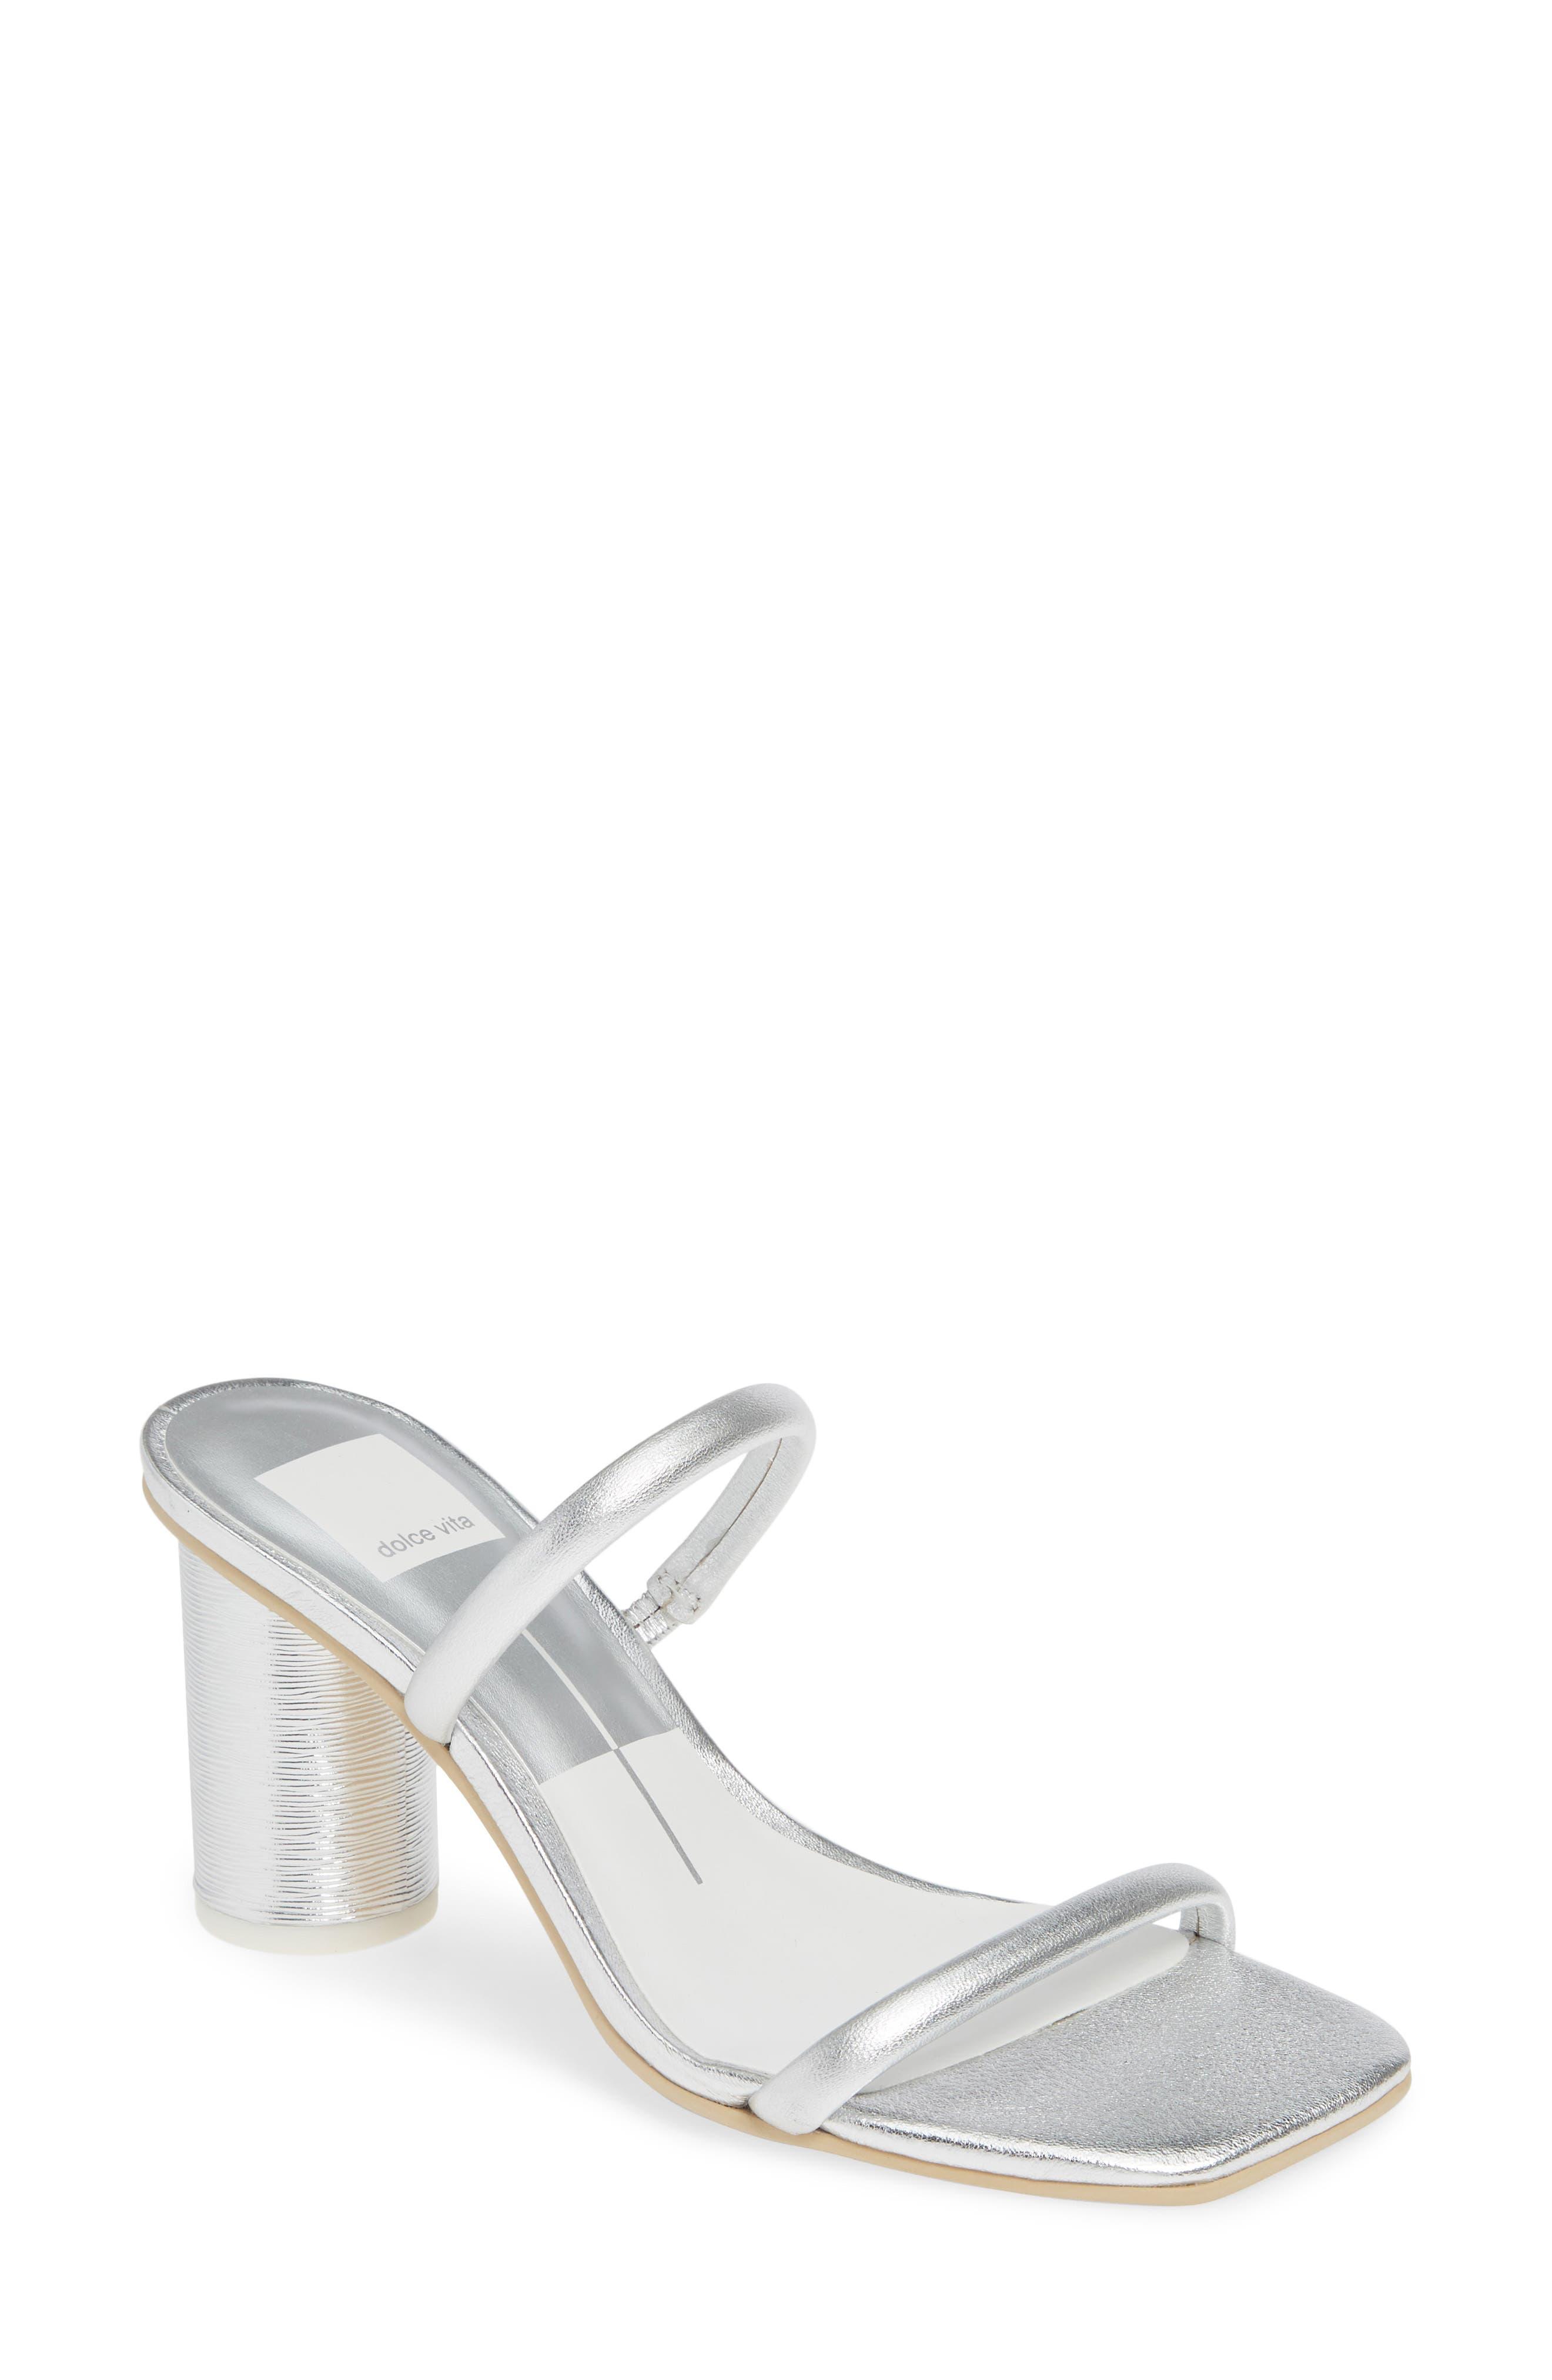 35f26859b41 Dolce Vita Block-Heel Sandals for Women